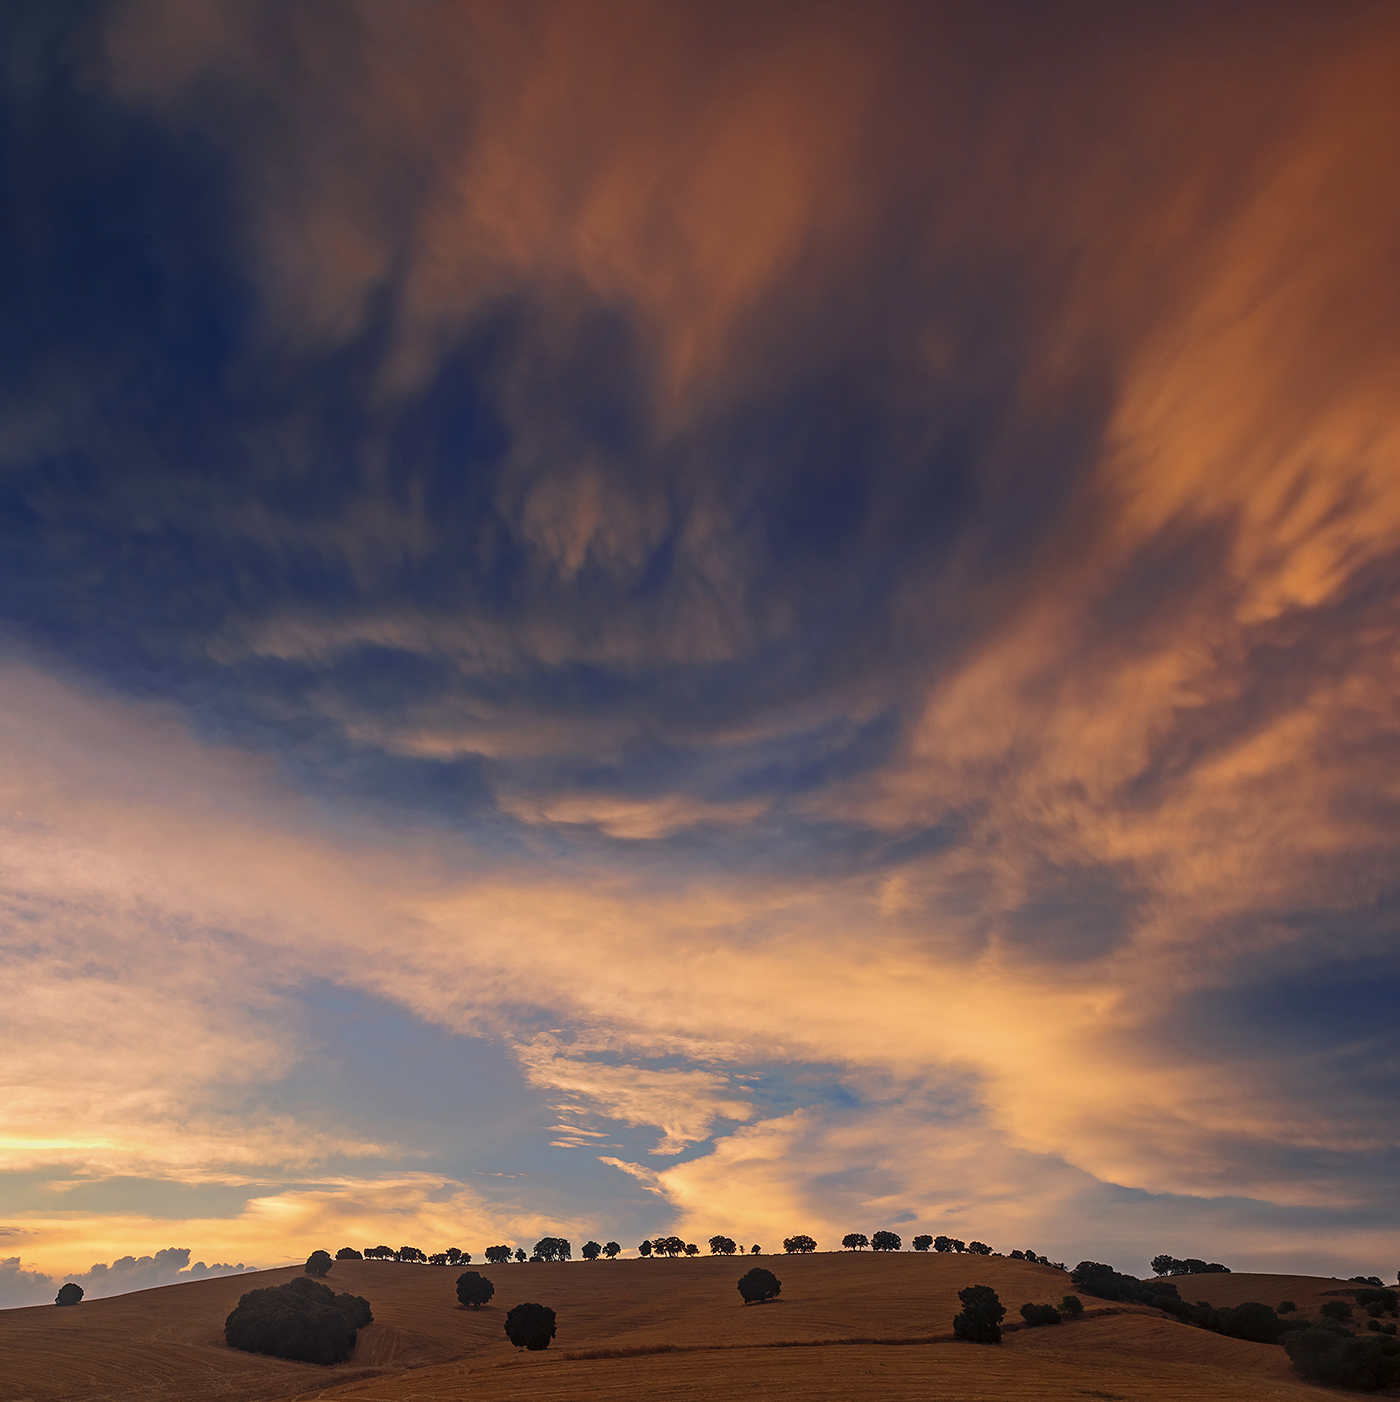 Montes Orientales - On fire - Peter Manschot Al Andalus Photo Tour, Landscape photography photos prints workshops Andalusia Spain